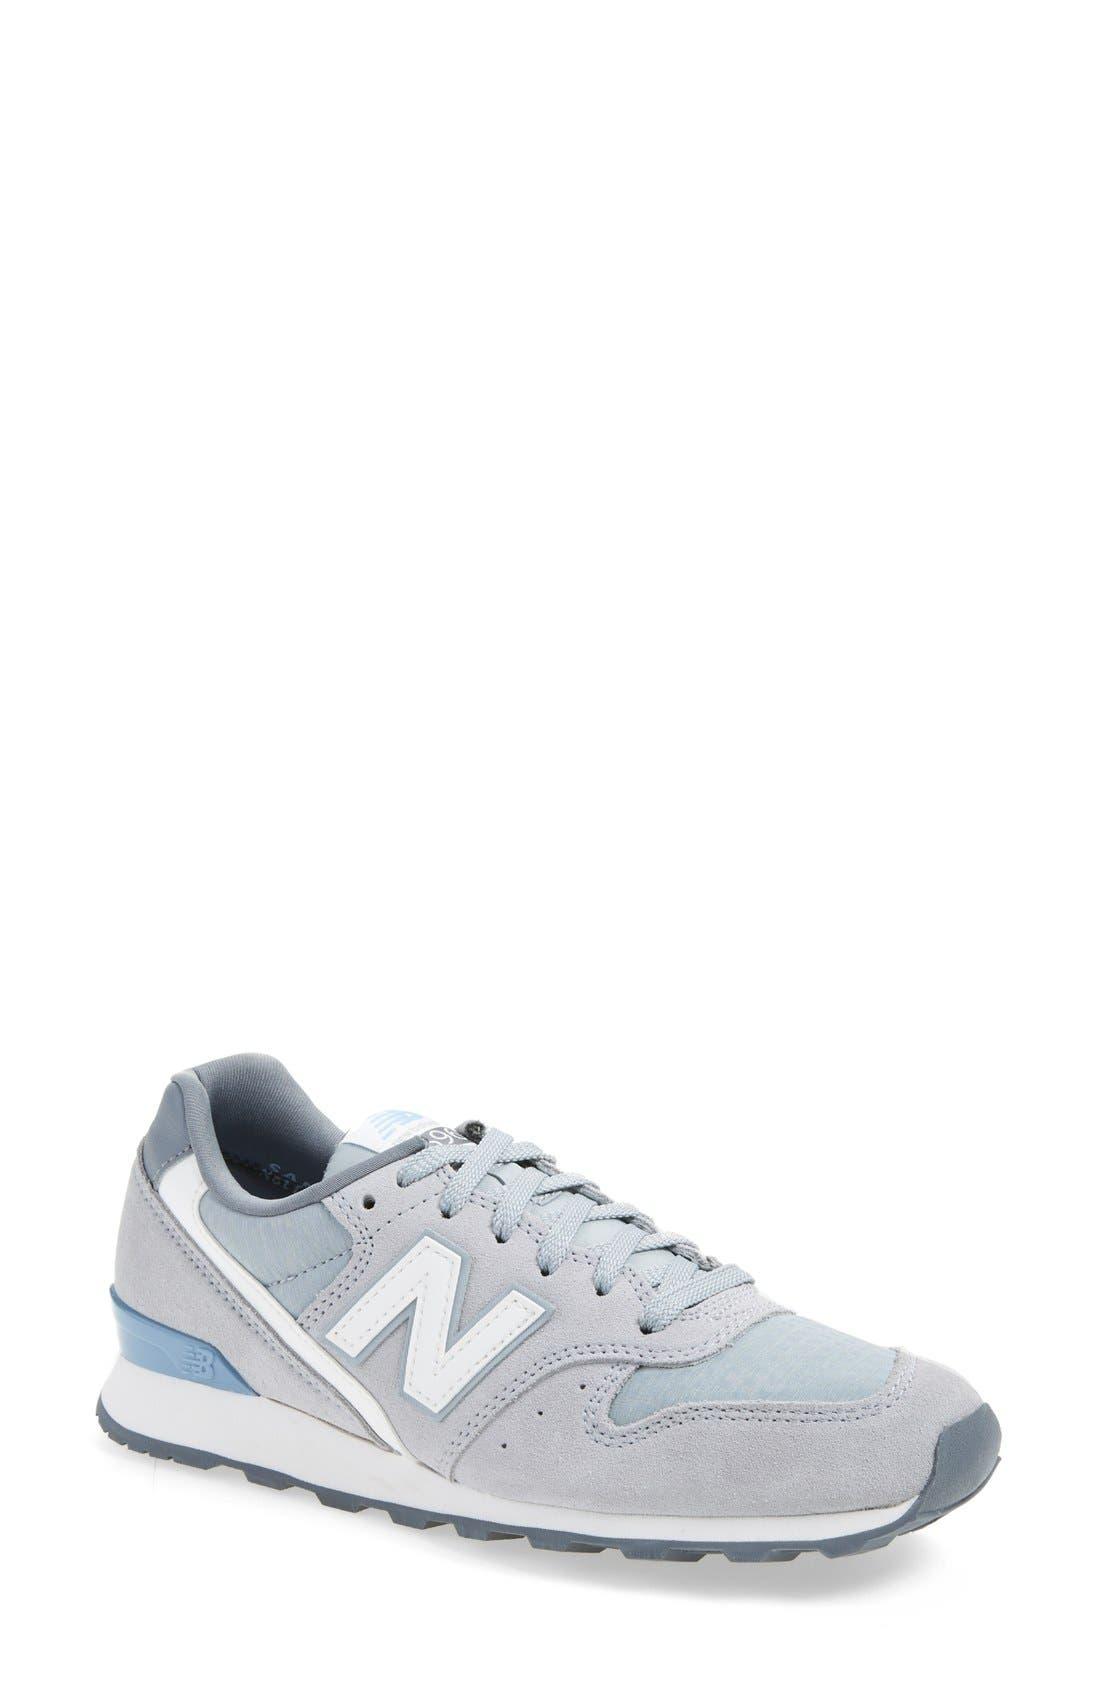 Alternate Image 1 Selected - New Balance '696' Sneaker (Women)